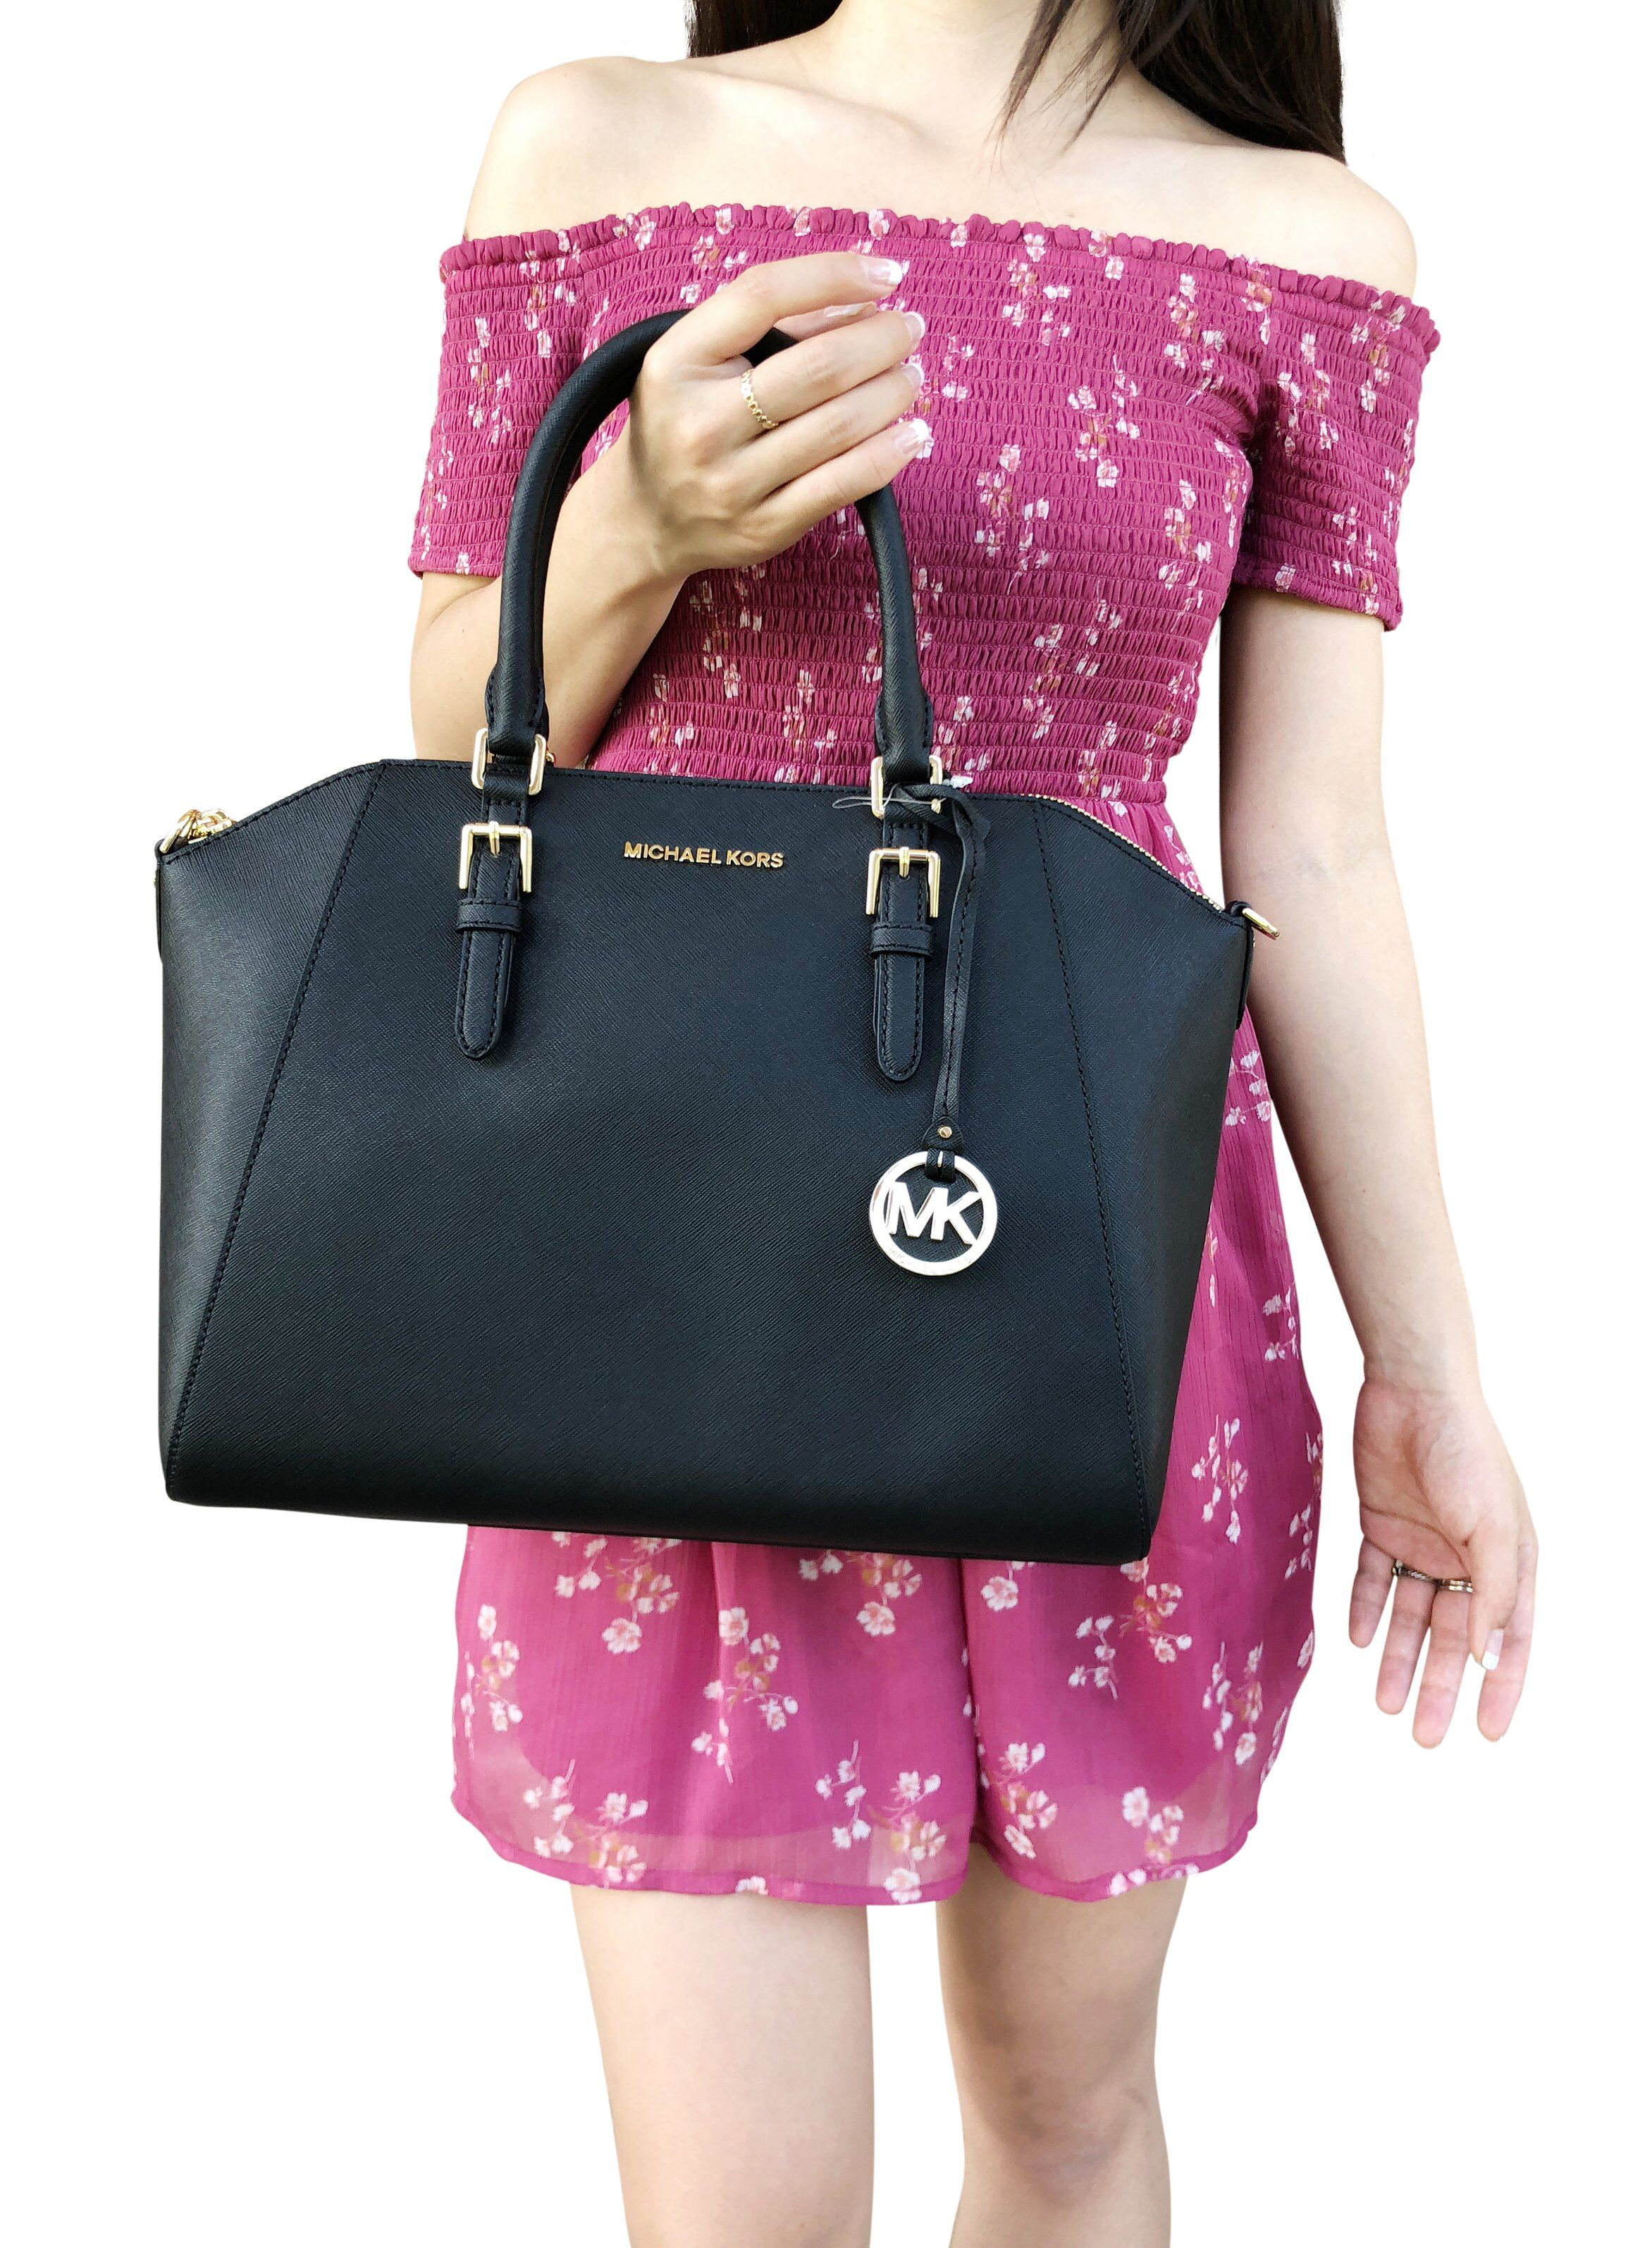 aa271583edc2 Michael Kors Large Ciara Top Zip Satchel Black Saffiano Leather #MK  #mercari #poshmark #amazondeals #ebayresellers #mercaricode #ebayreseller  #Posher ...